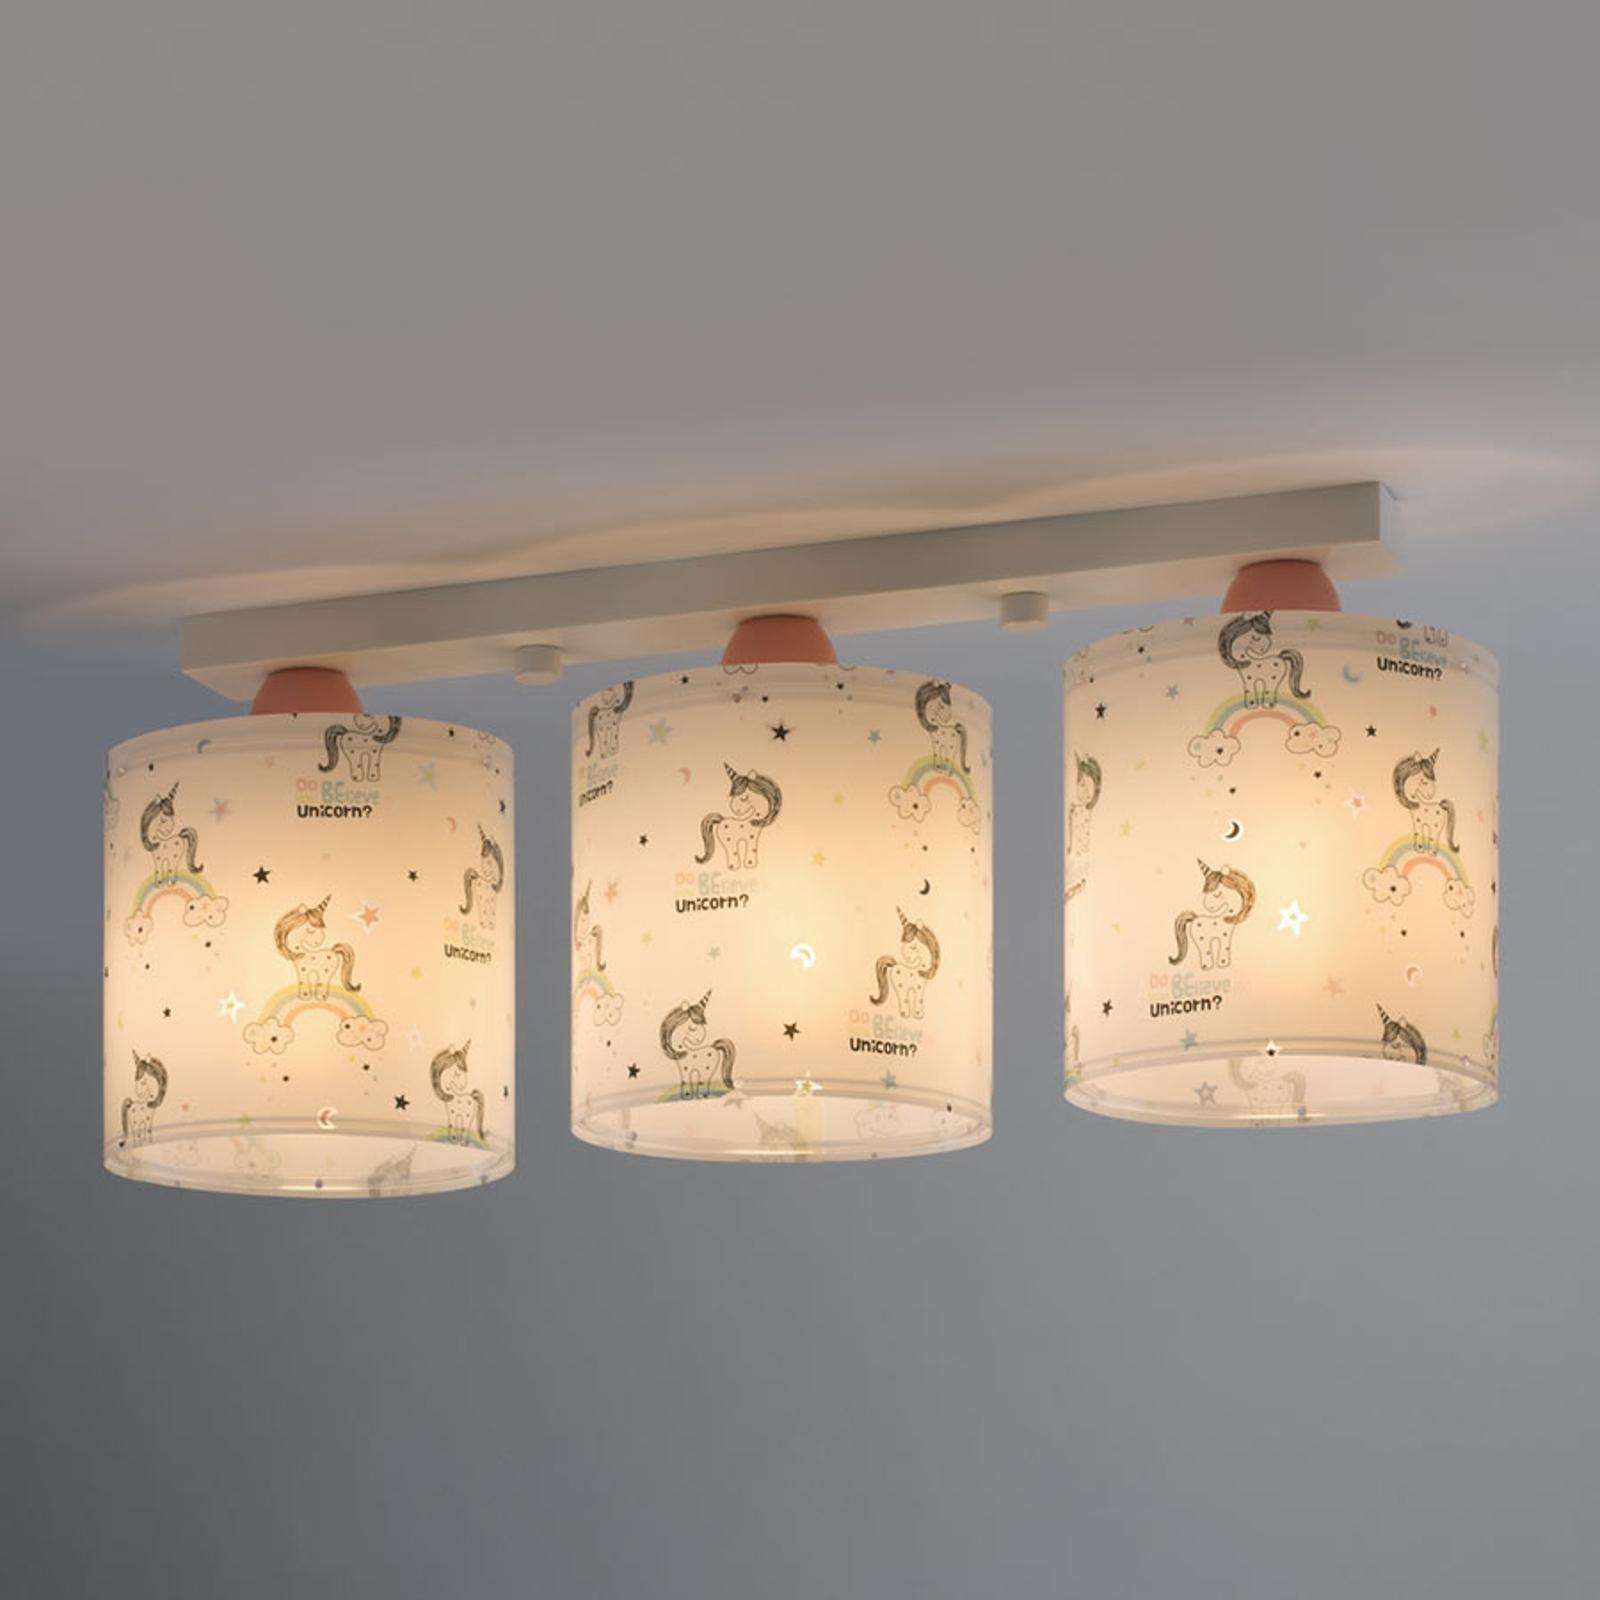 Taklampa Unicorns 3 lampor